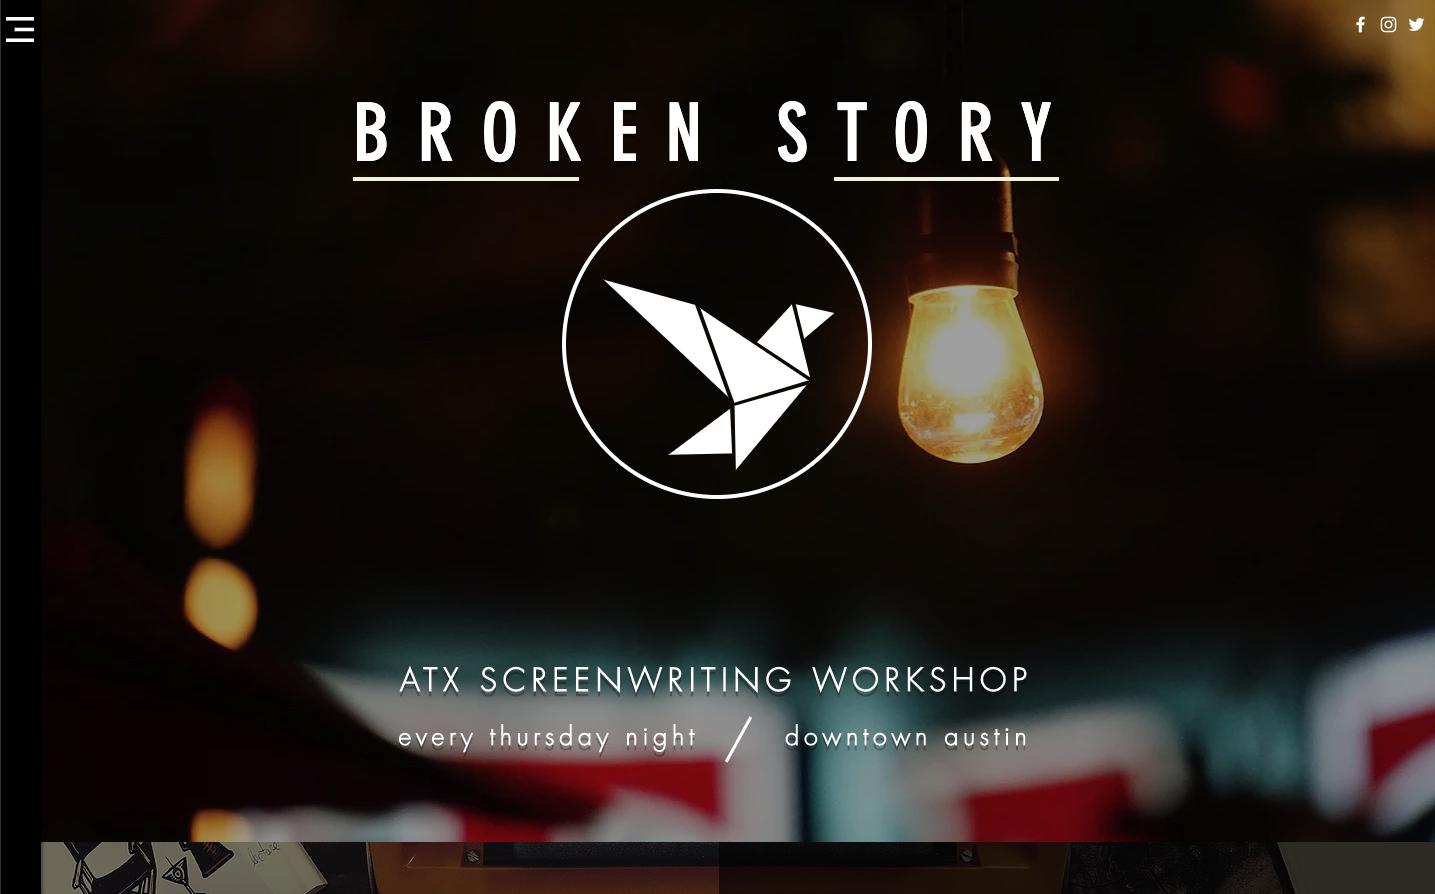 Broken Story